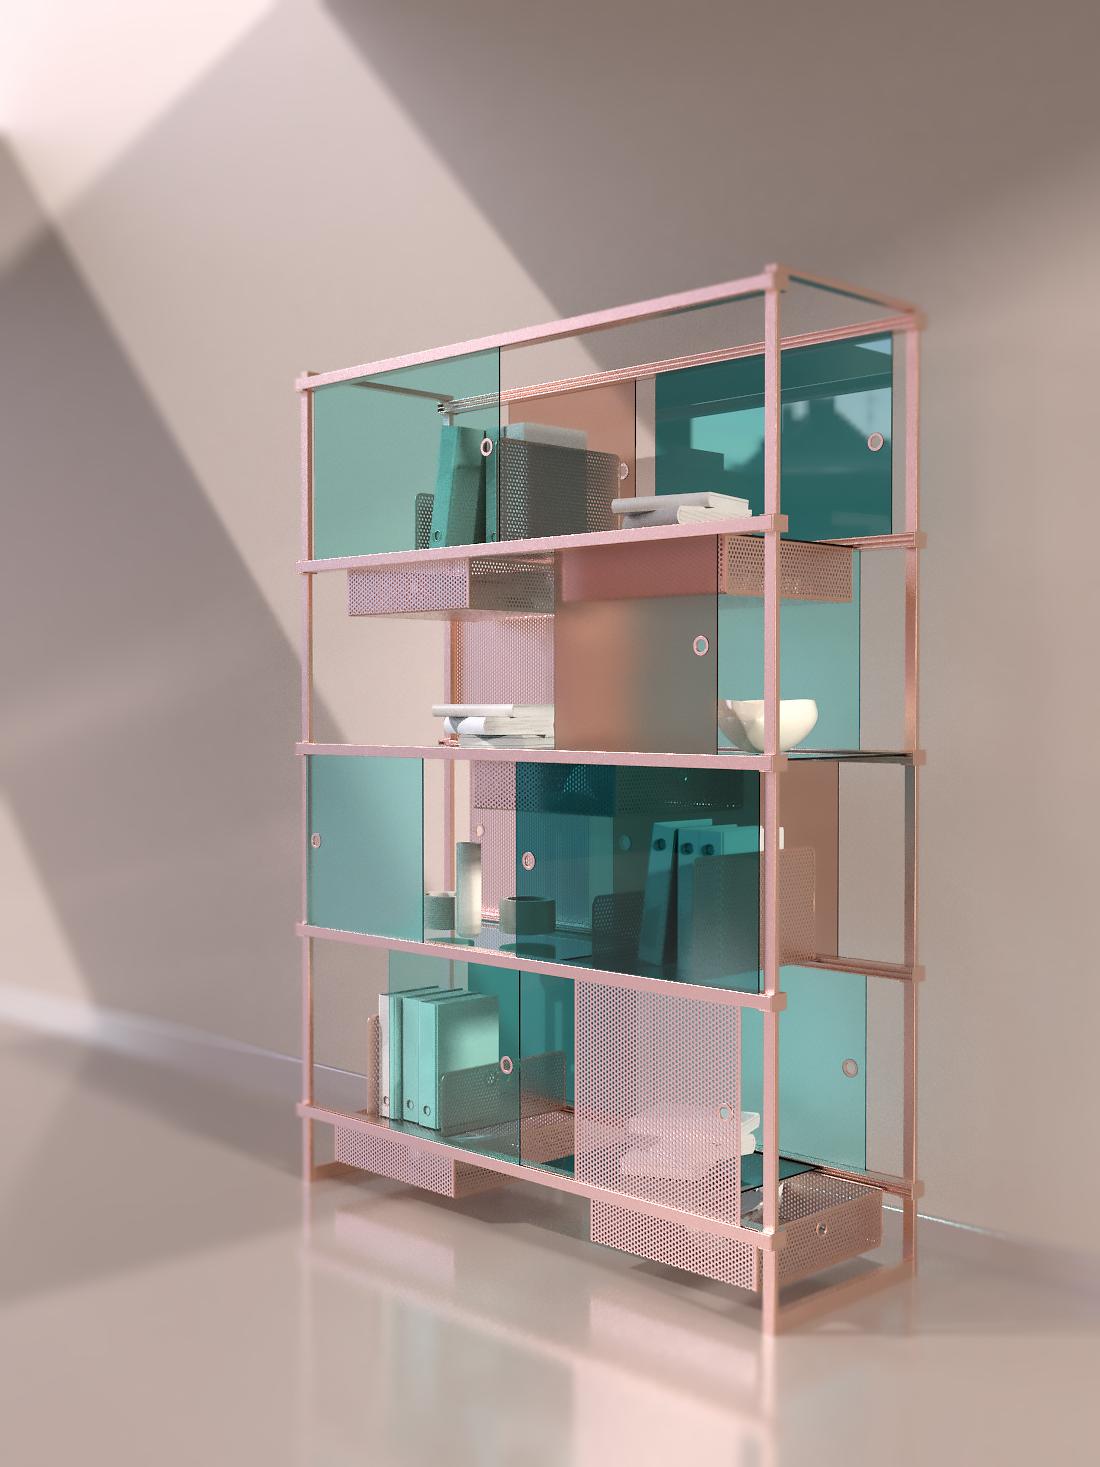 wanderlust_cabinet_explorer_roze_modular_leandra-eibl_ventura_salone_del_mobile_milan_design_week_2b.png